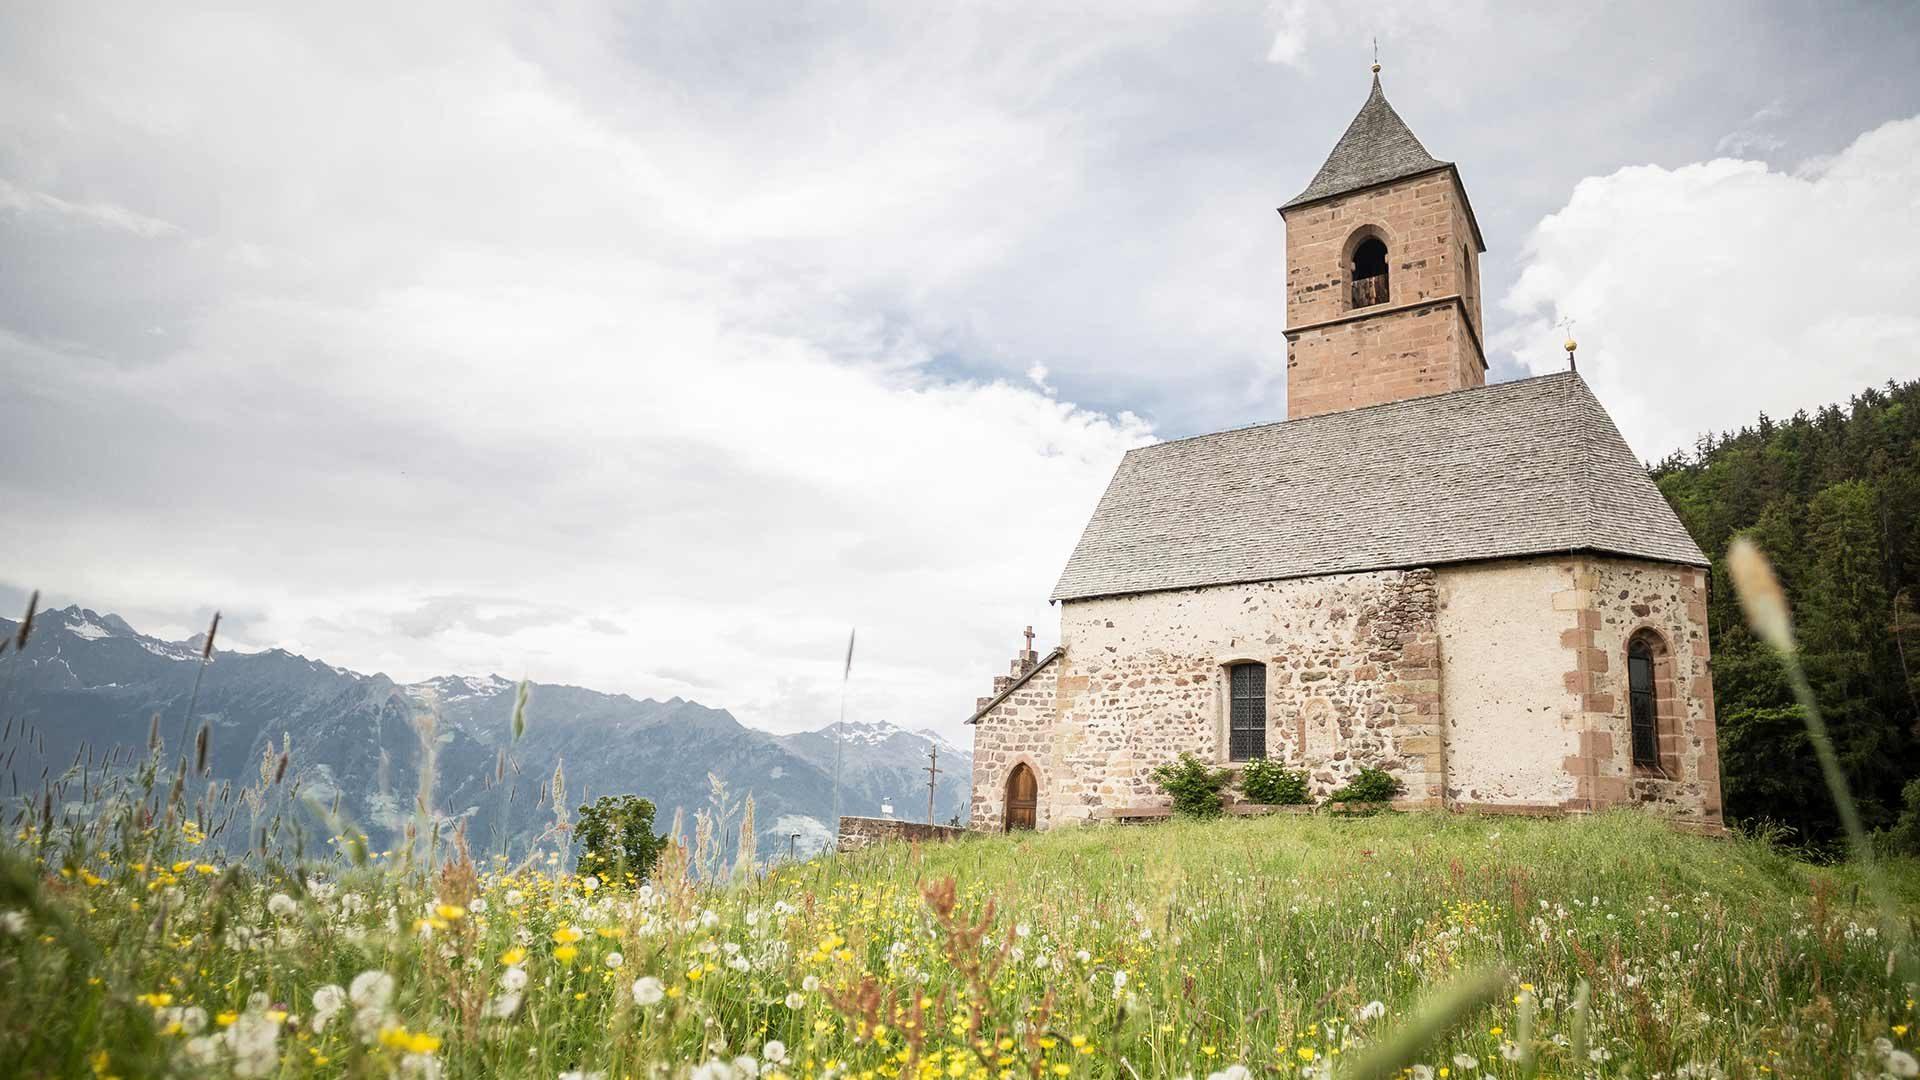 St. Kathrein Kirche in Hafling